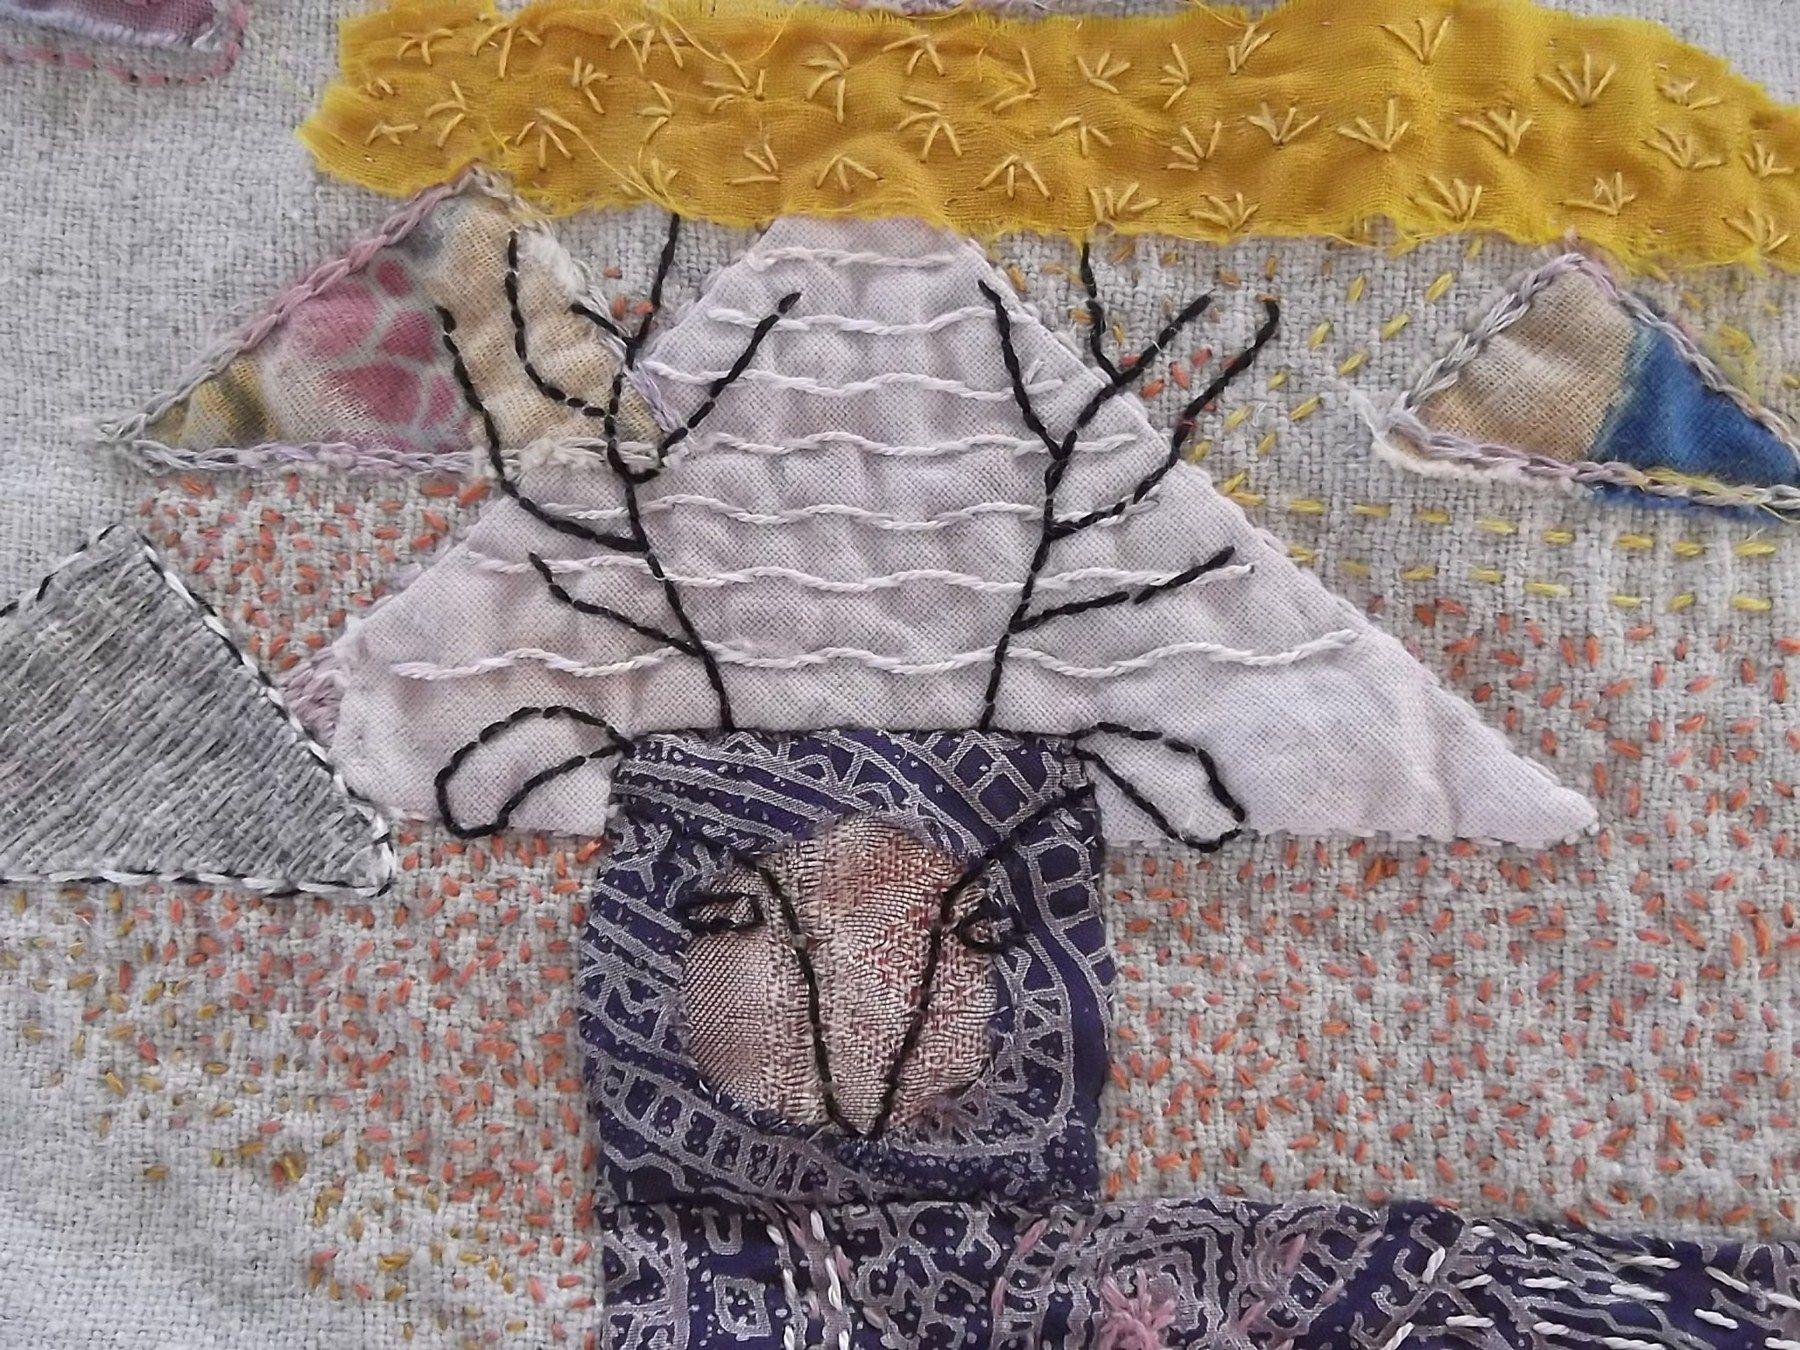 wednes2 Quilting studio, Textiles, Slow stitching